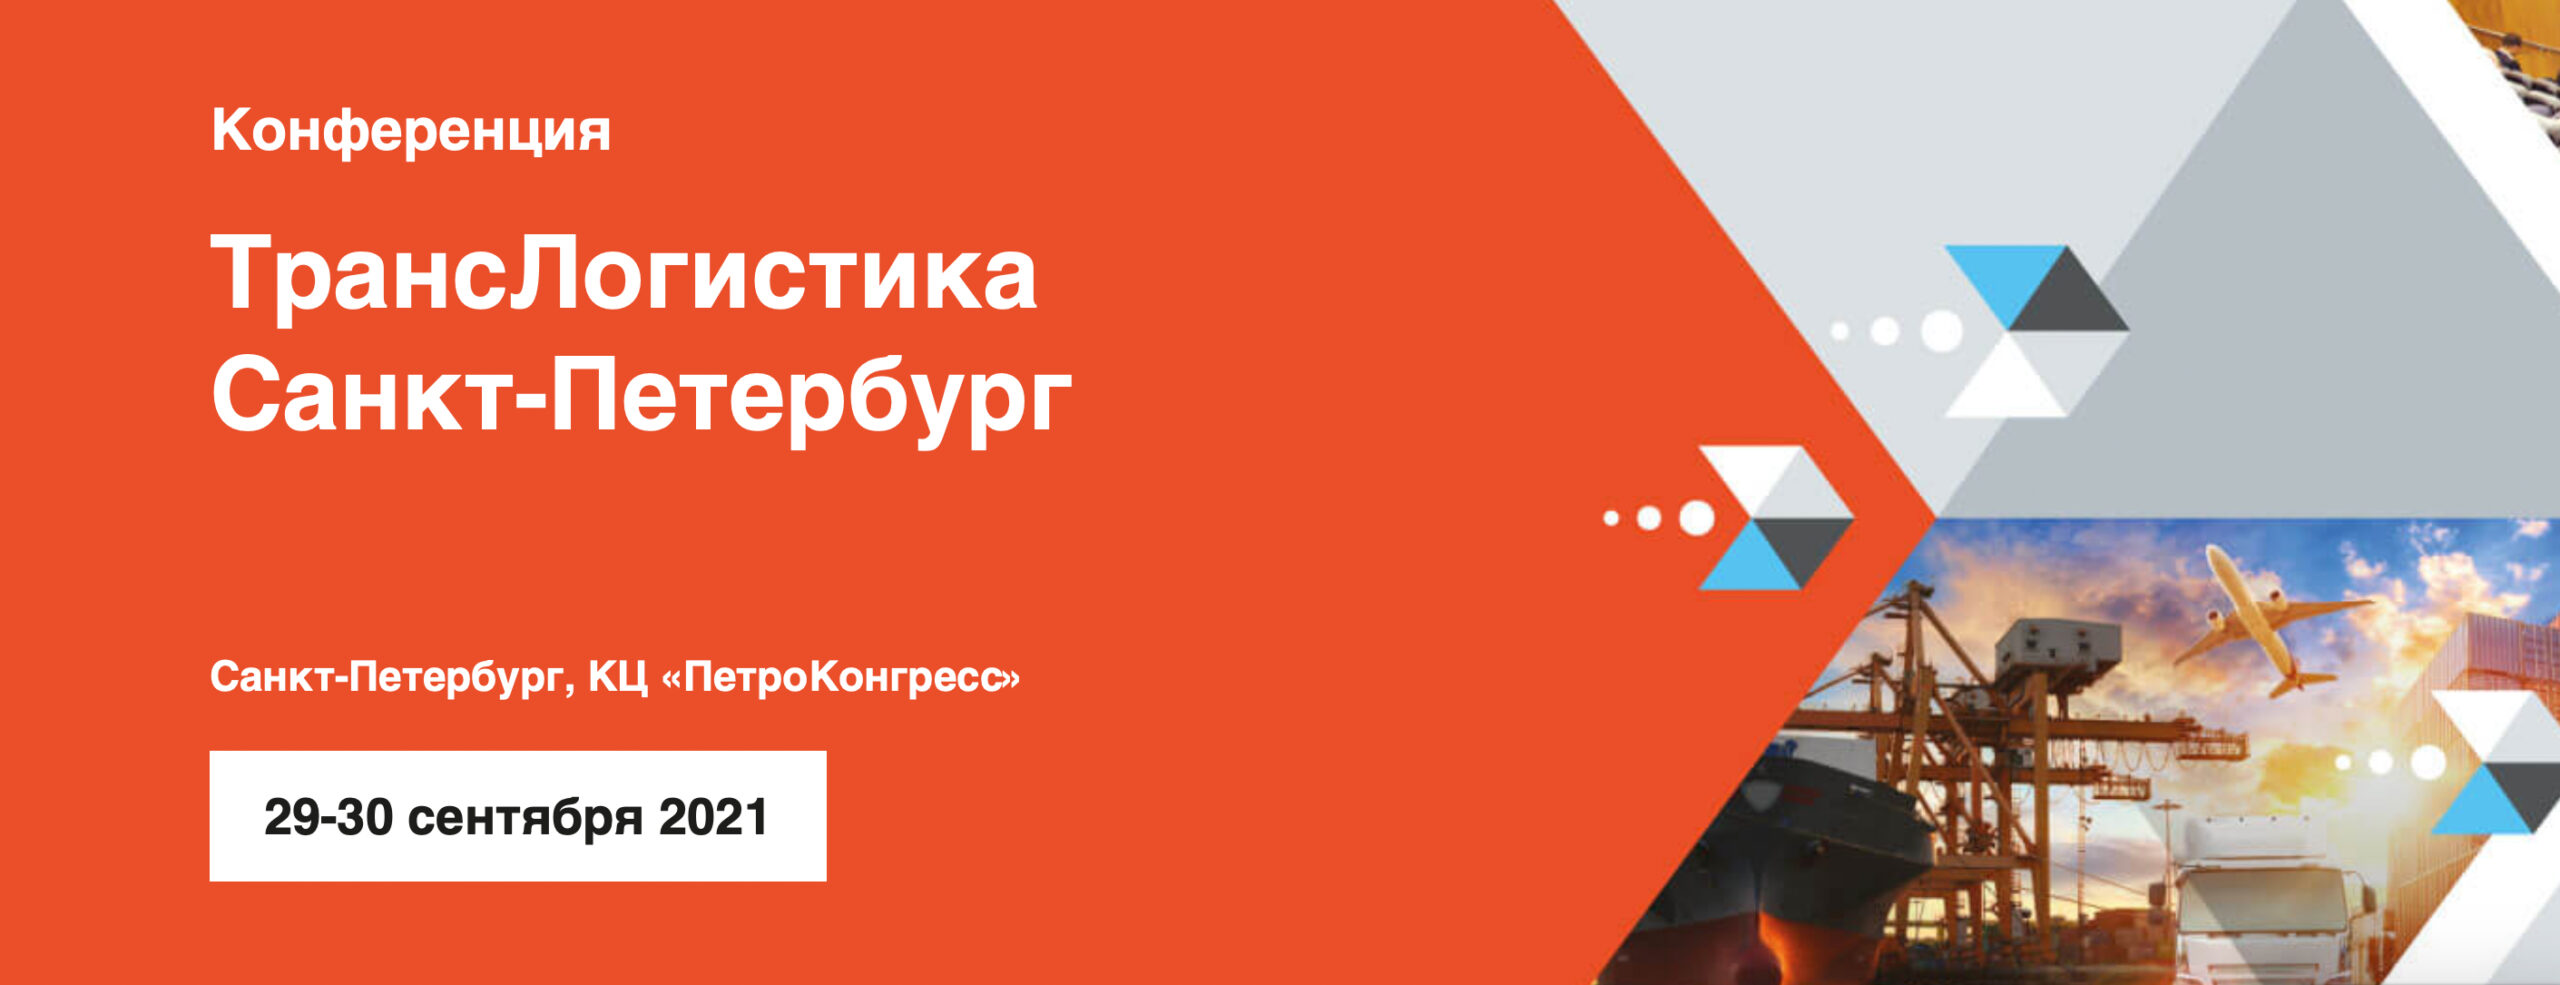 ТТ Клуб – партнёр конференции ТрансЛогистика Санкт-Петербург 2021